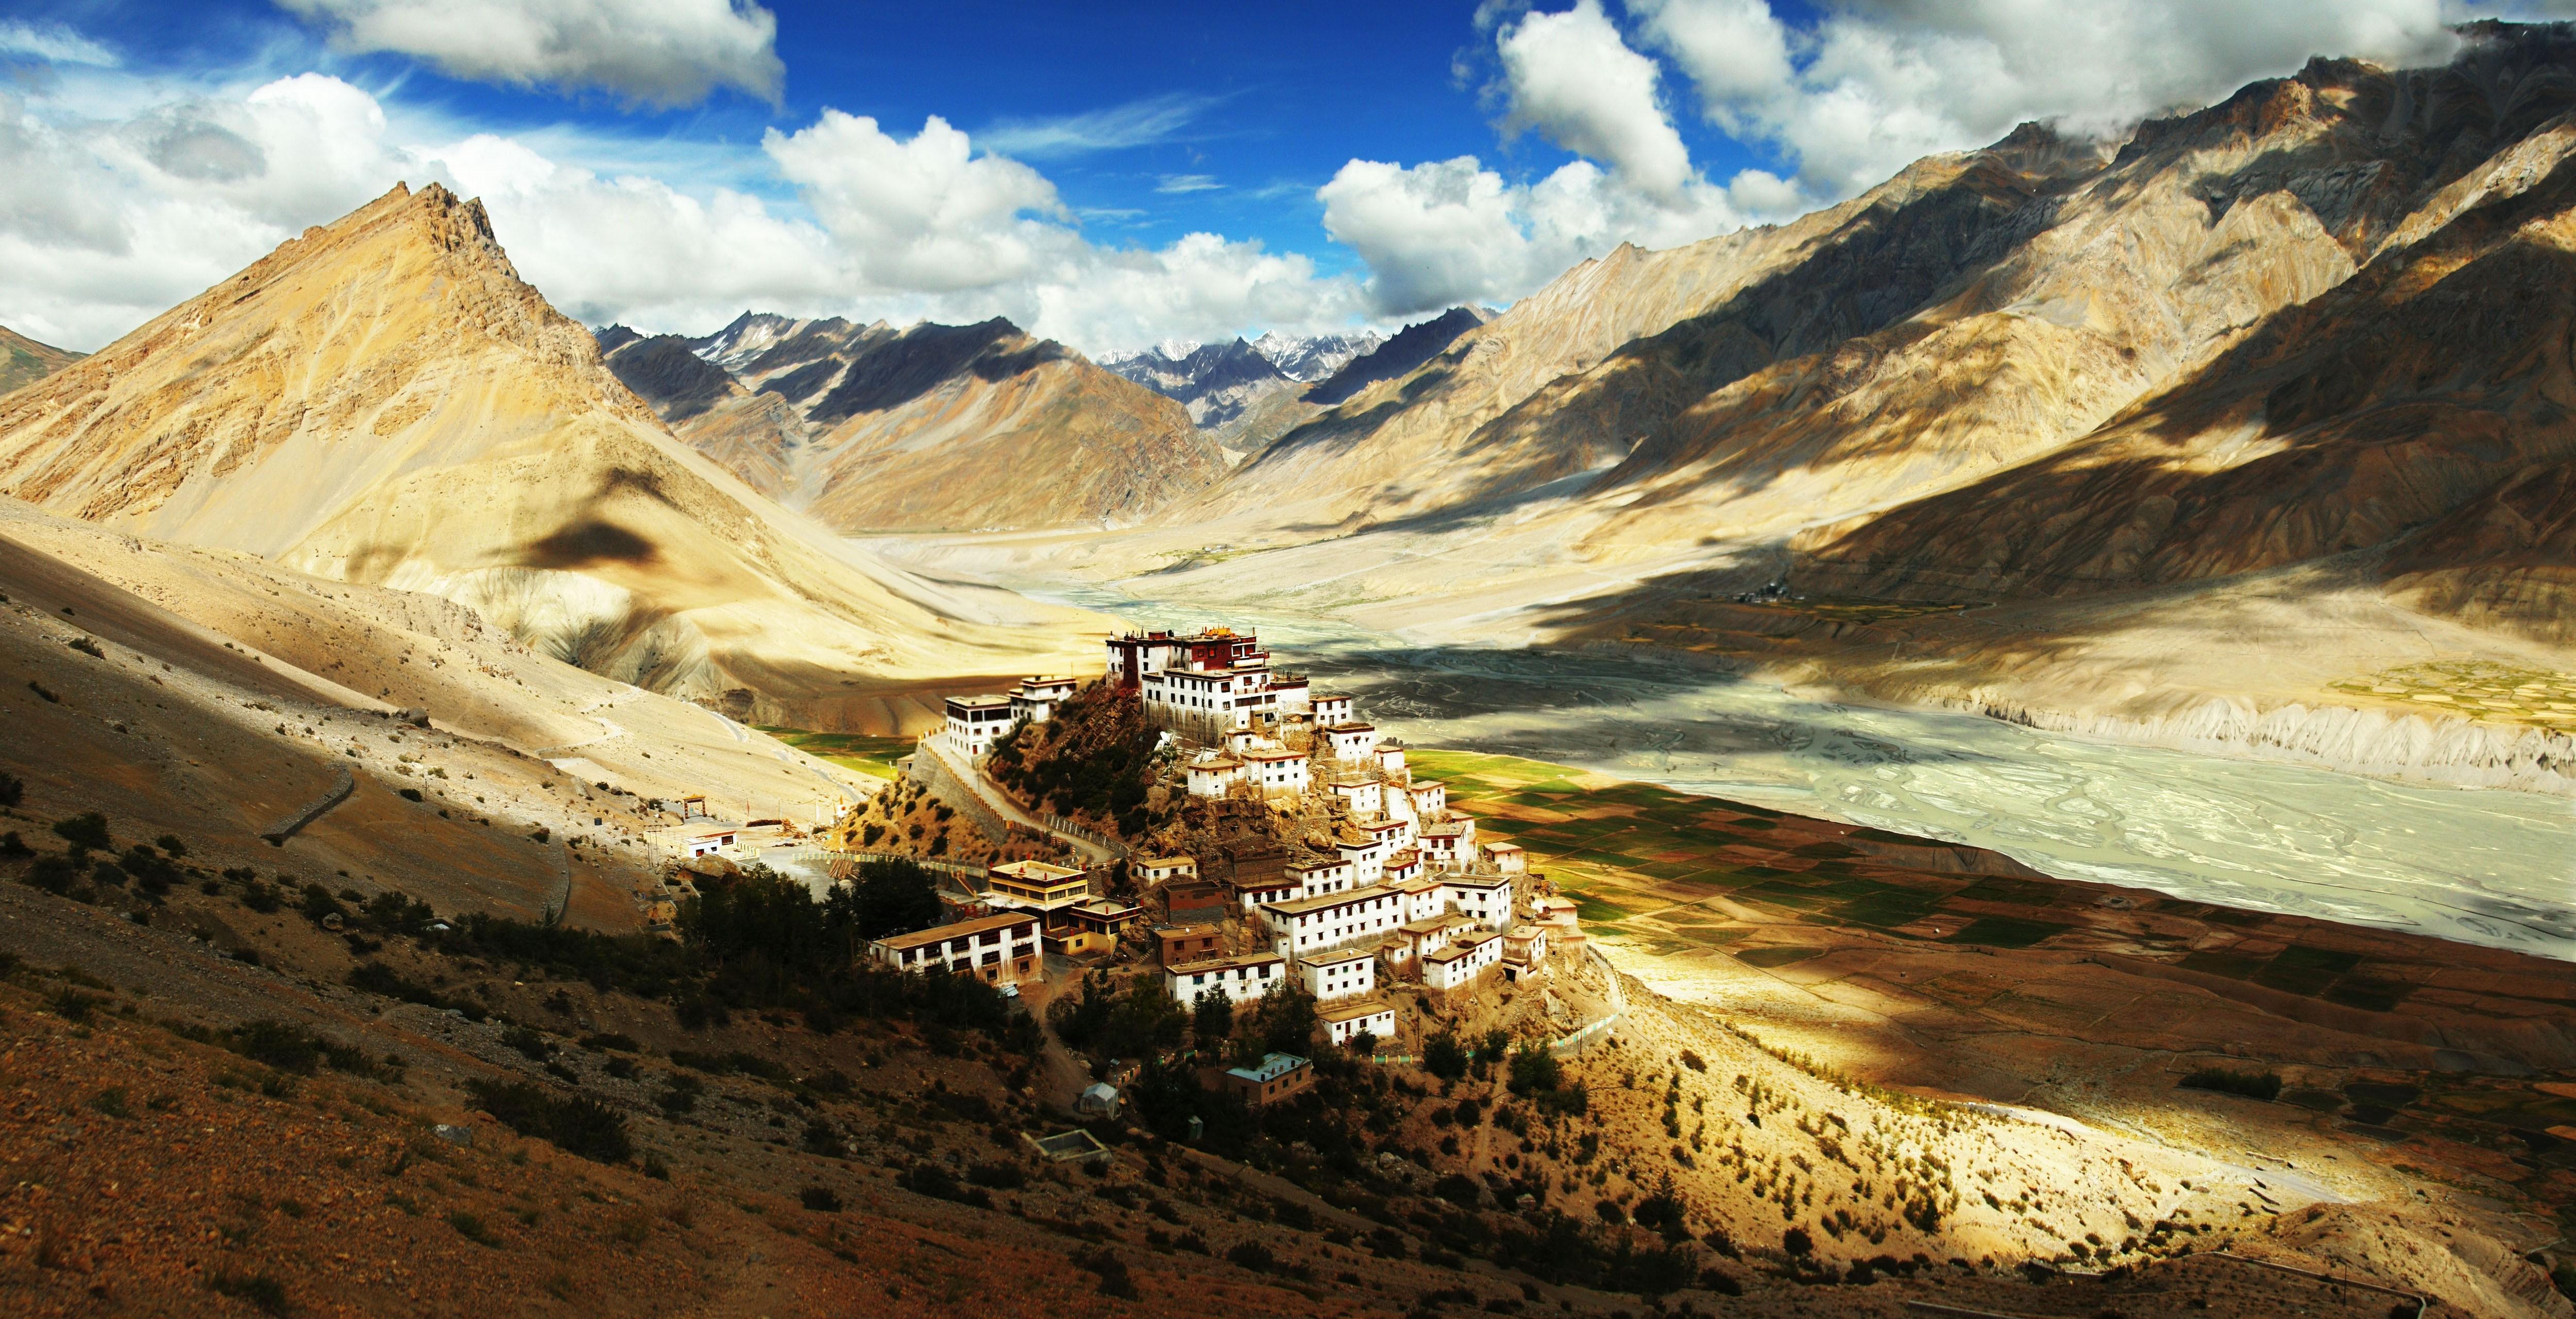 wallpaper : landscape, valley, wilderness, plateau, tibet, terrain